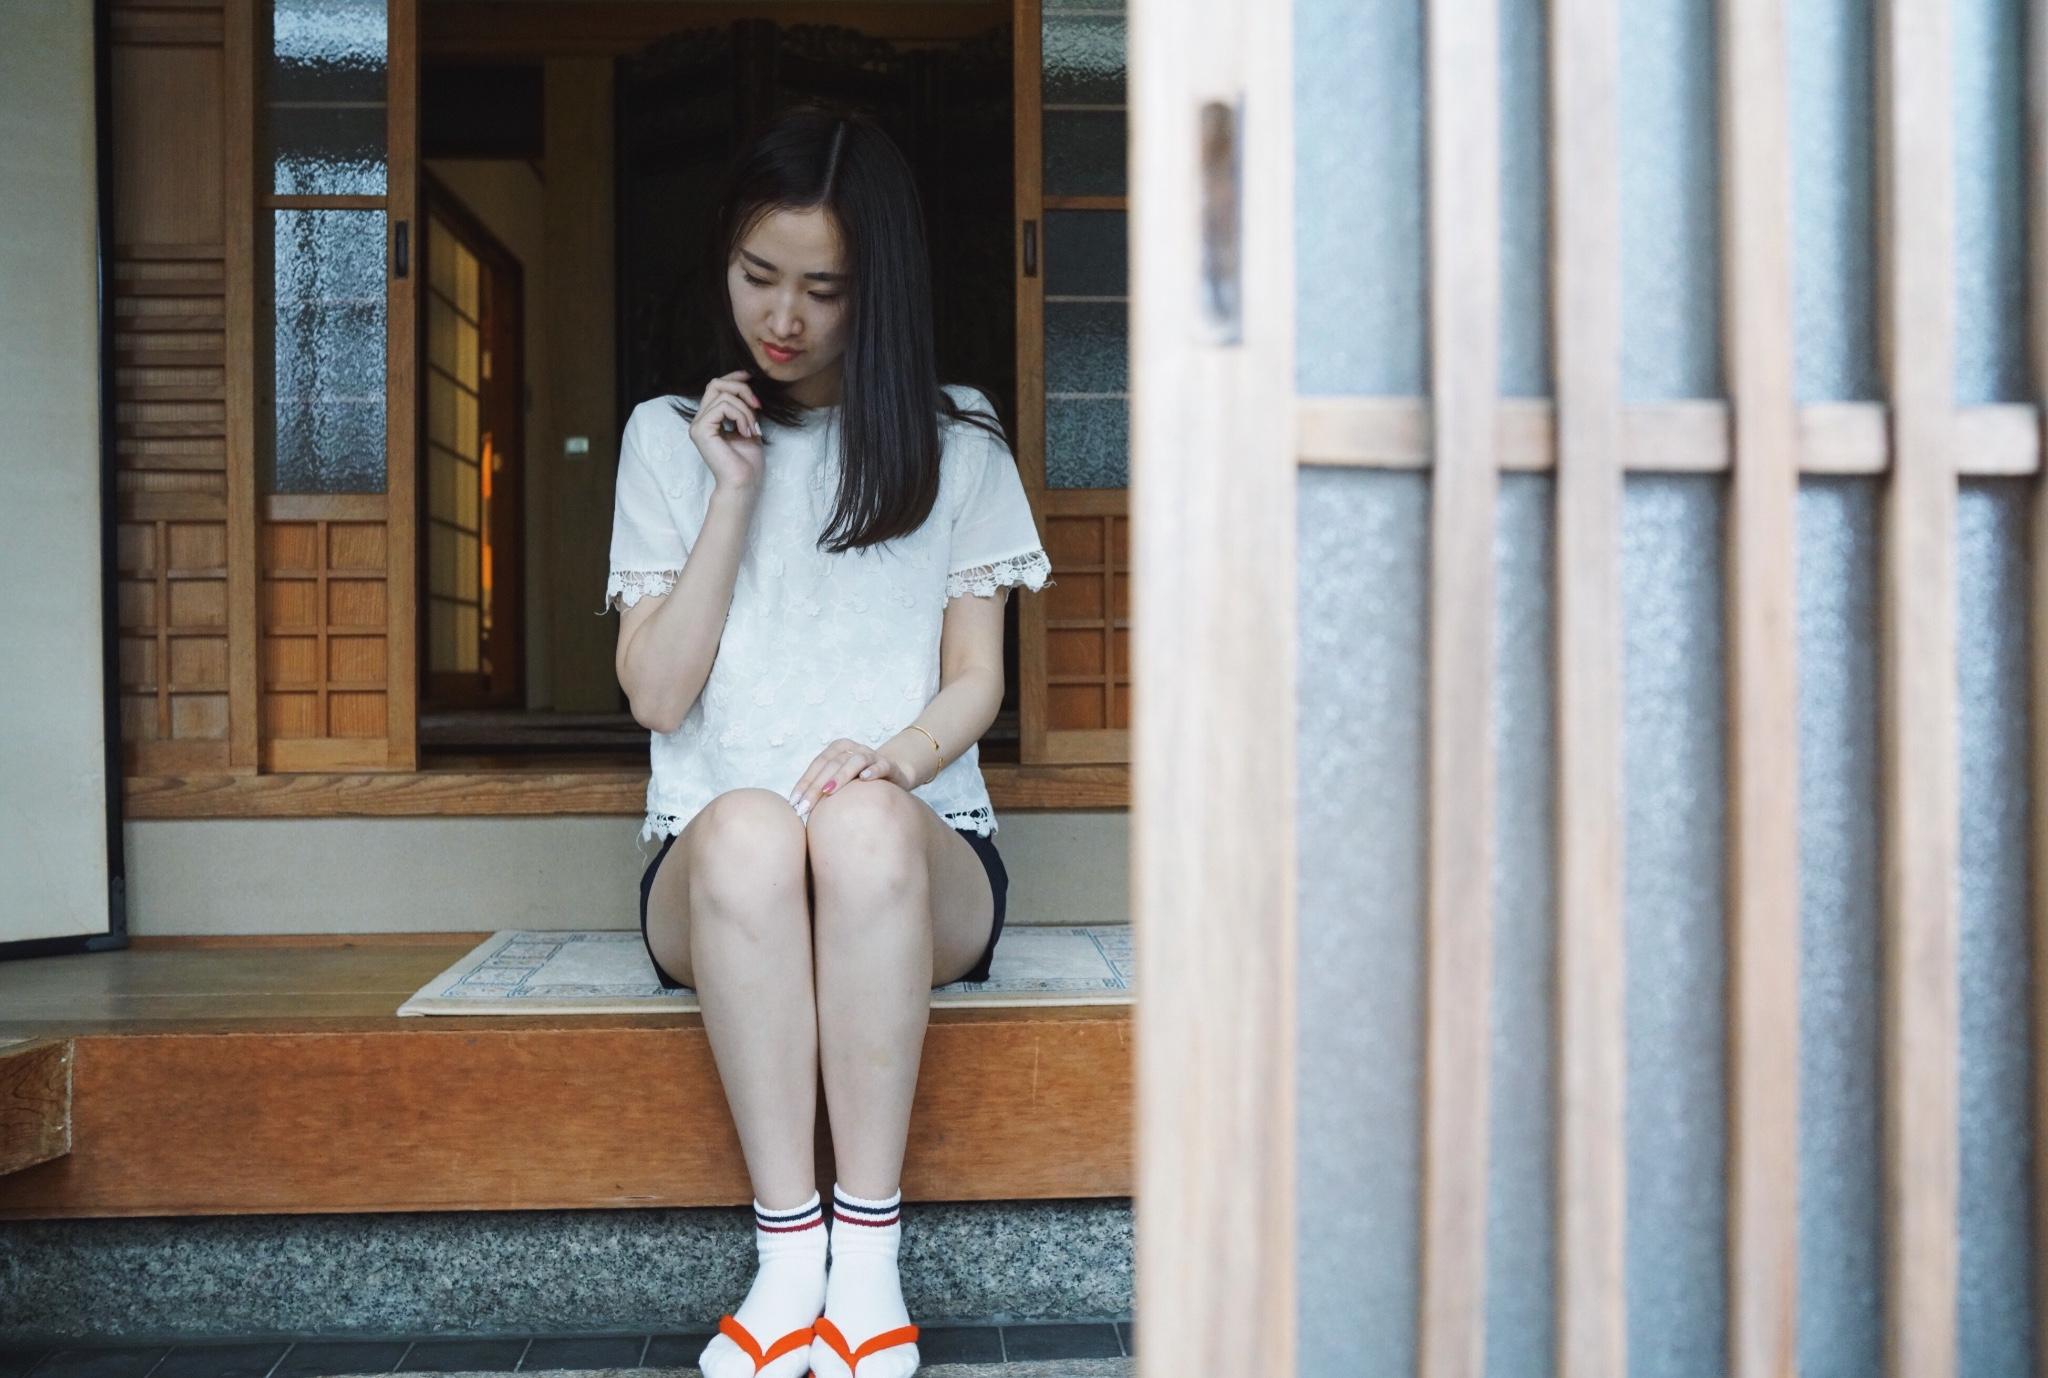 Shiori-an